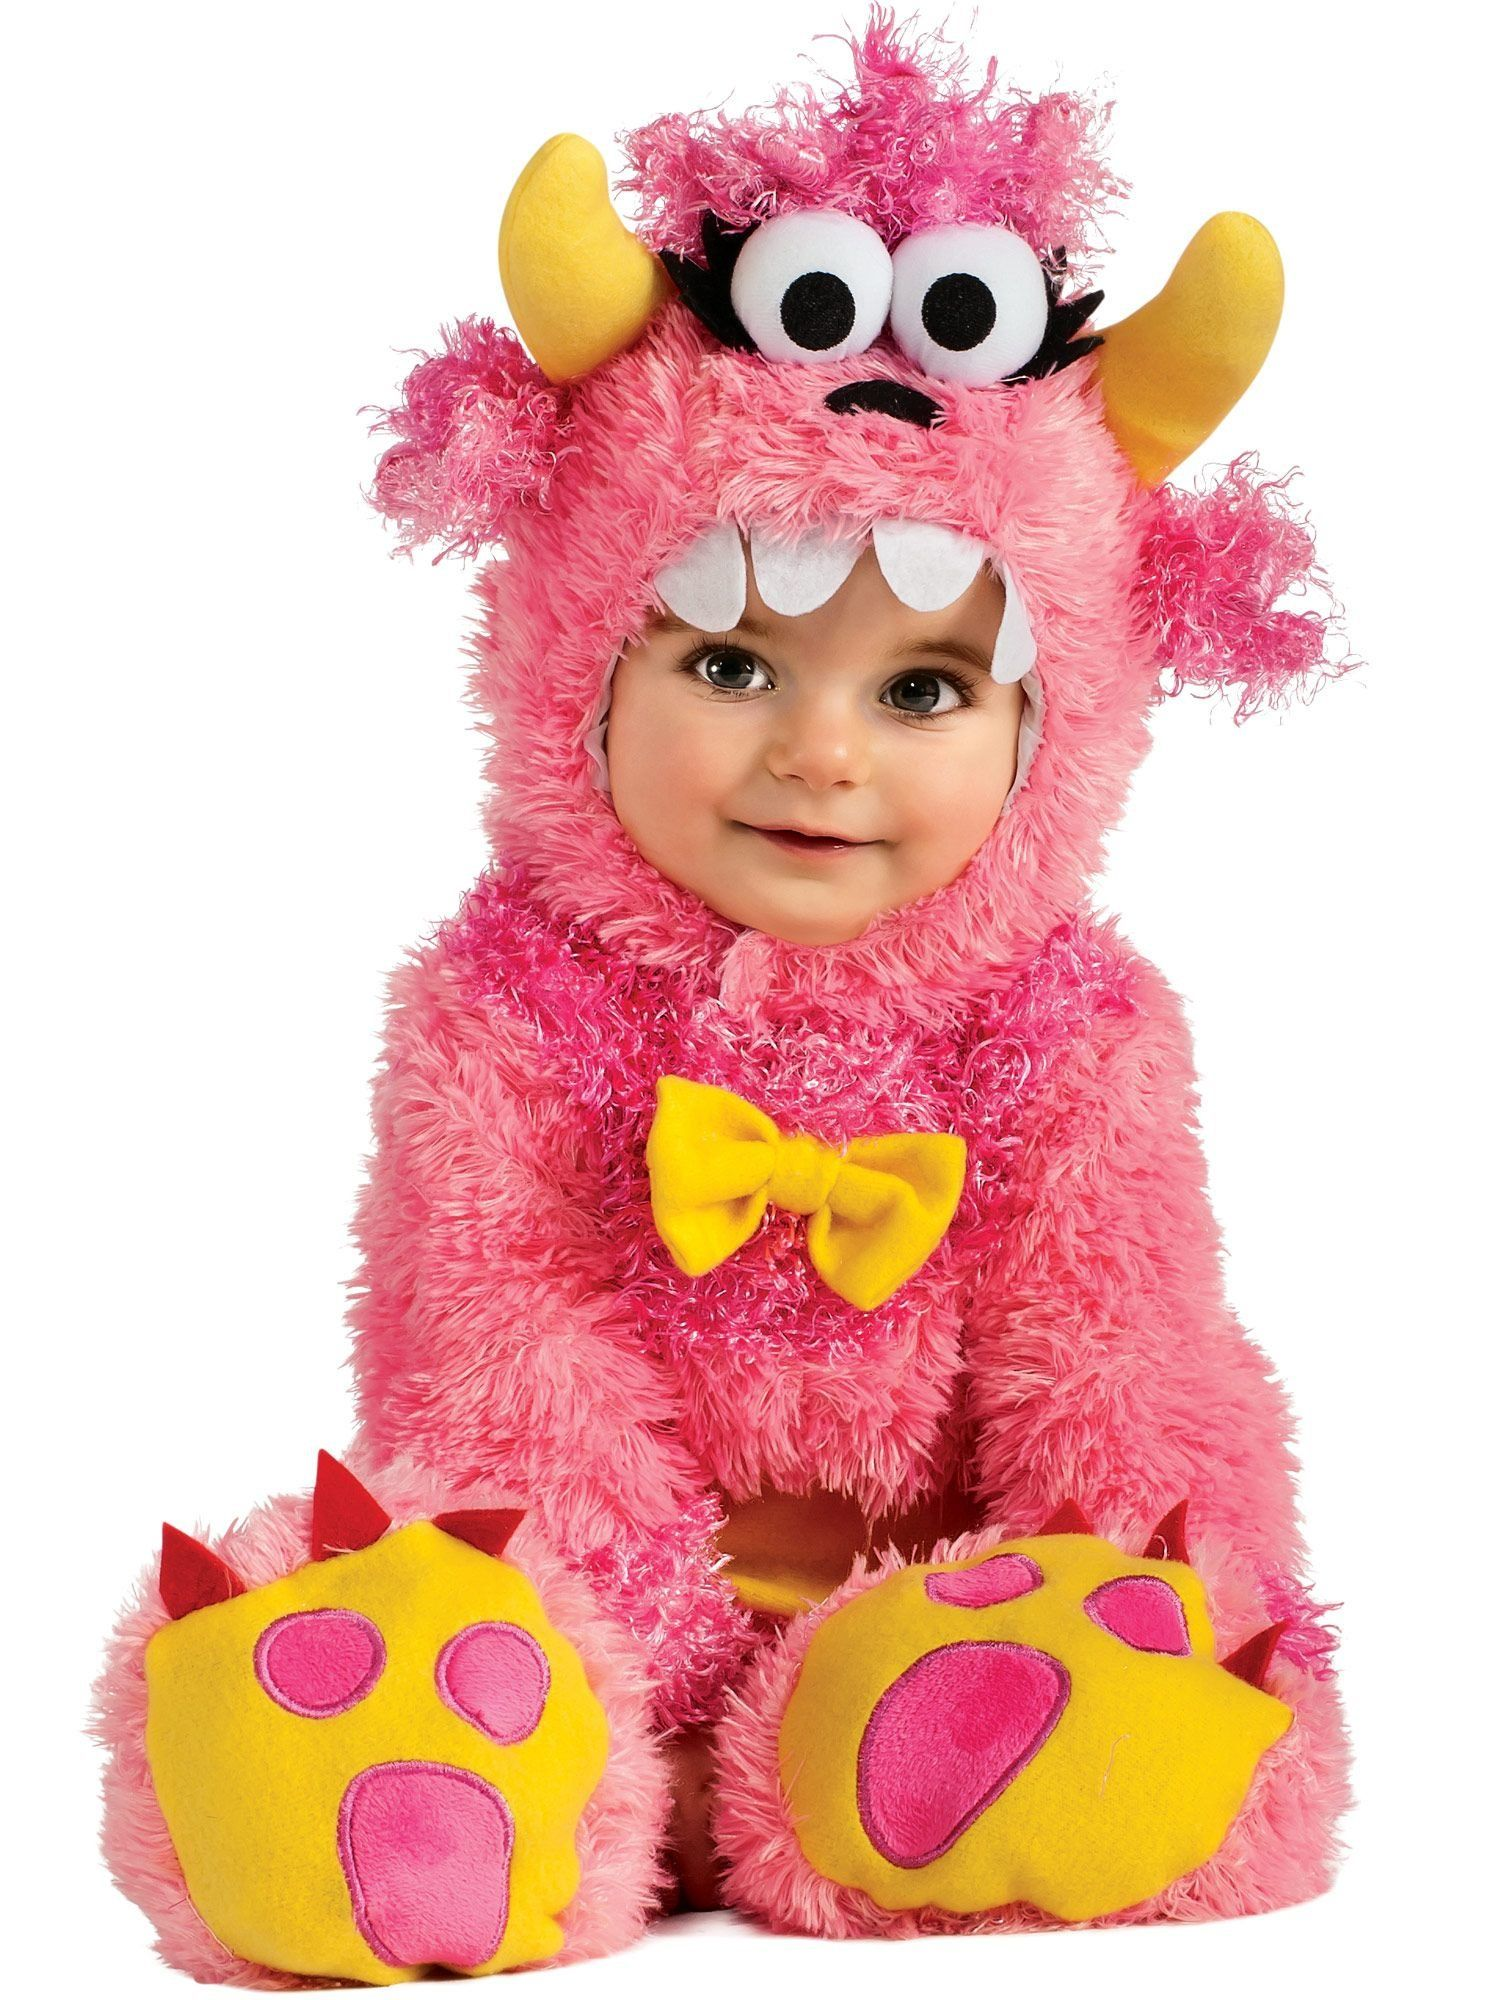 Baby Pinky Winky Costume Baby Monster Costumes Baby Halloween Costumes Toddler Halloween Baby First Halloween